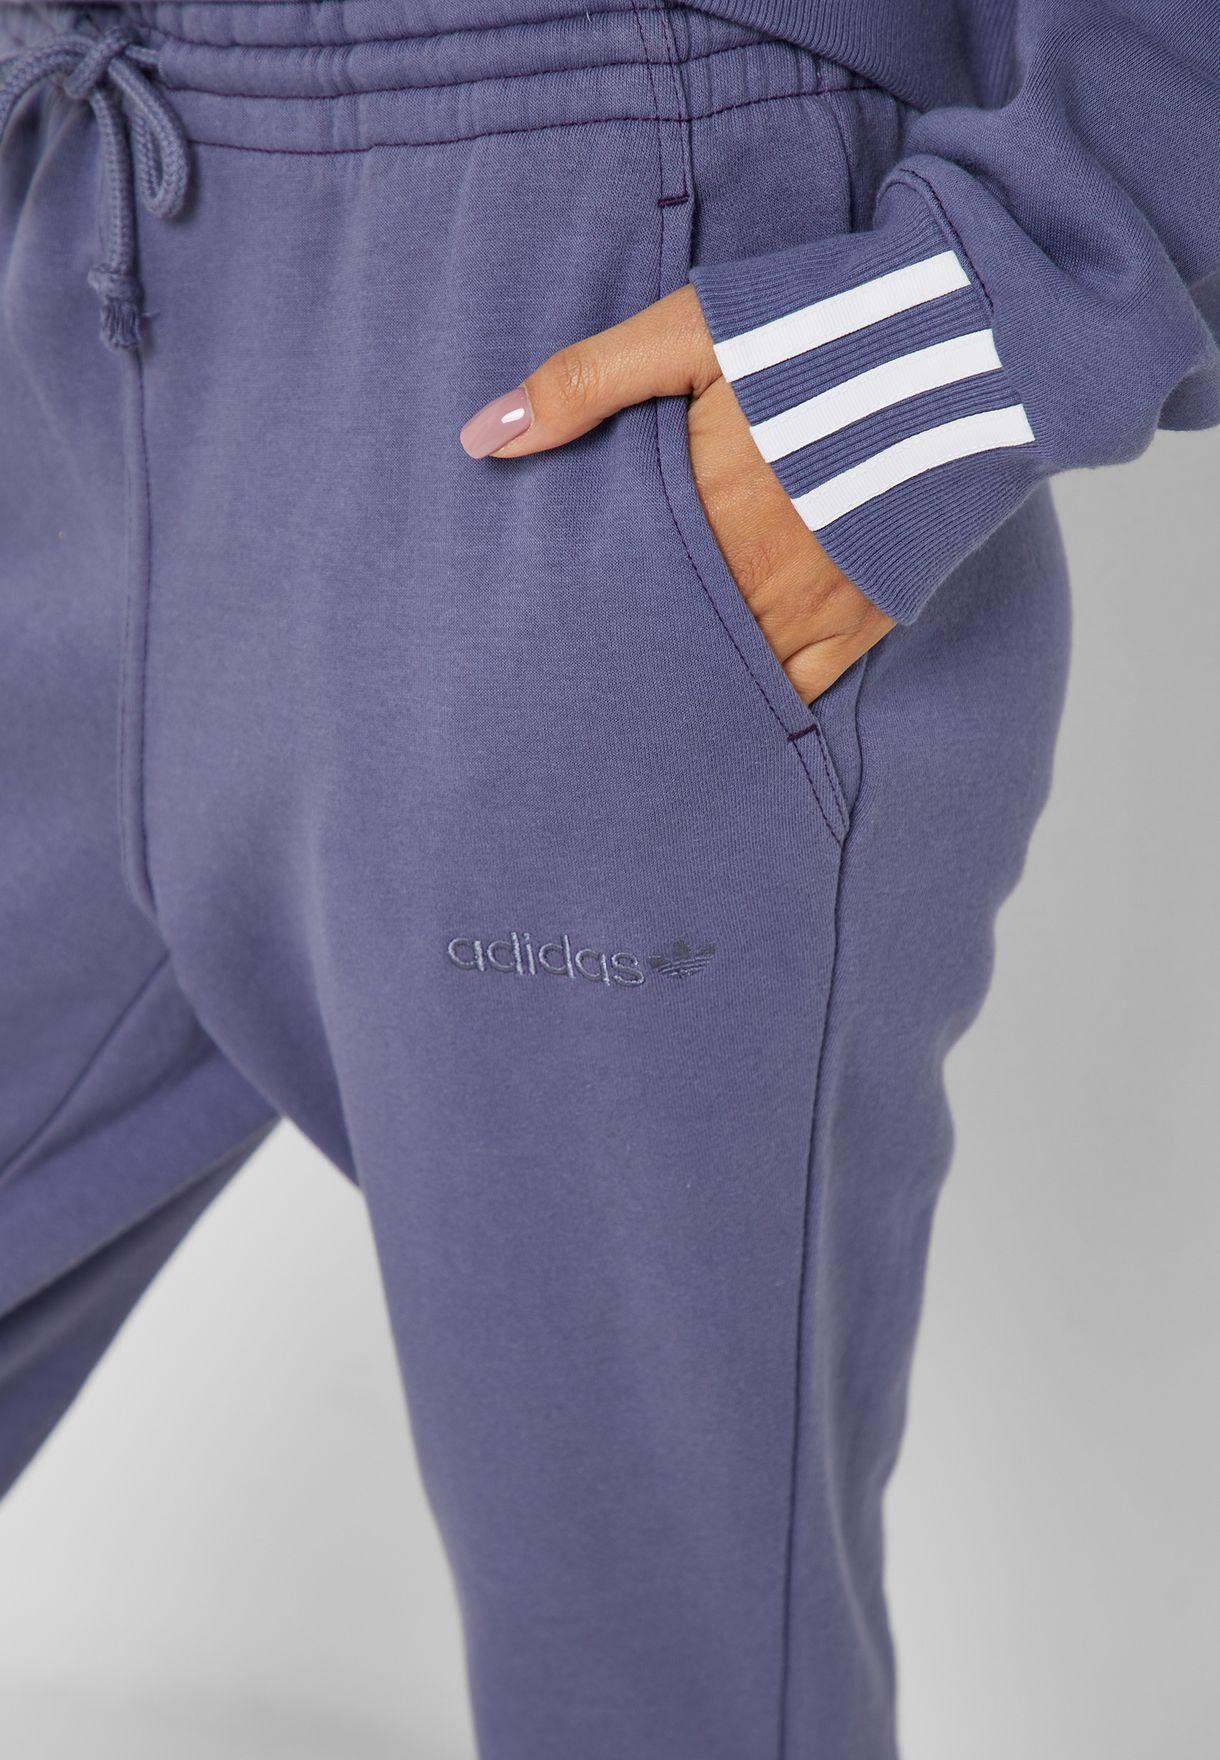 Coeeze Sweatpants